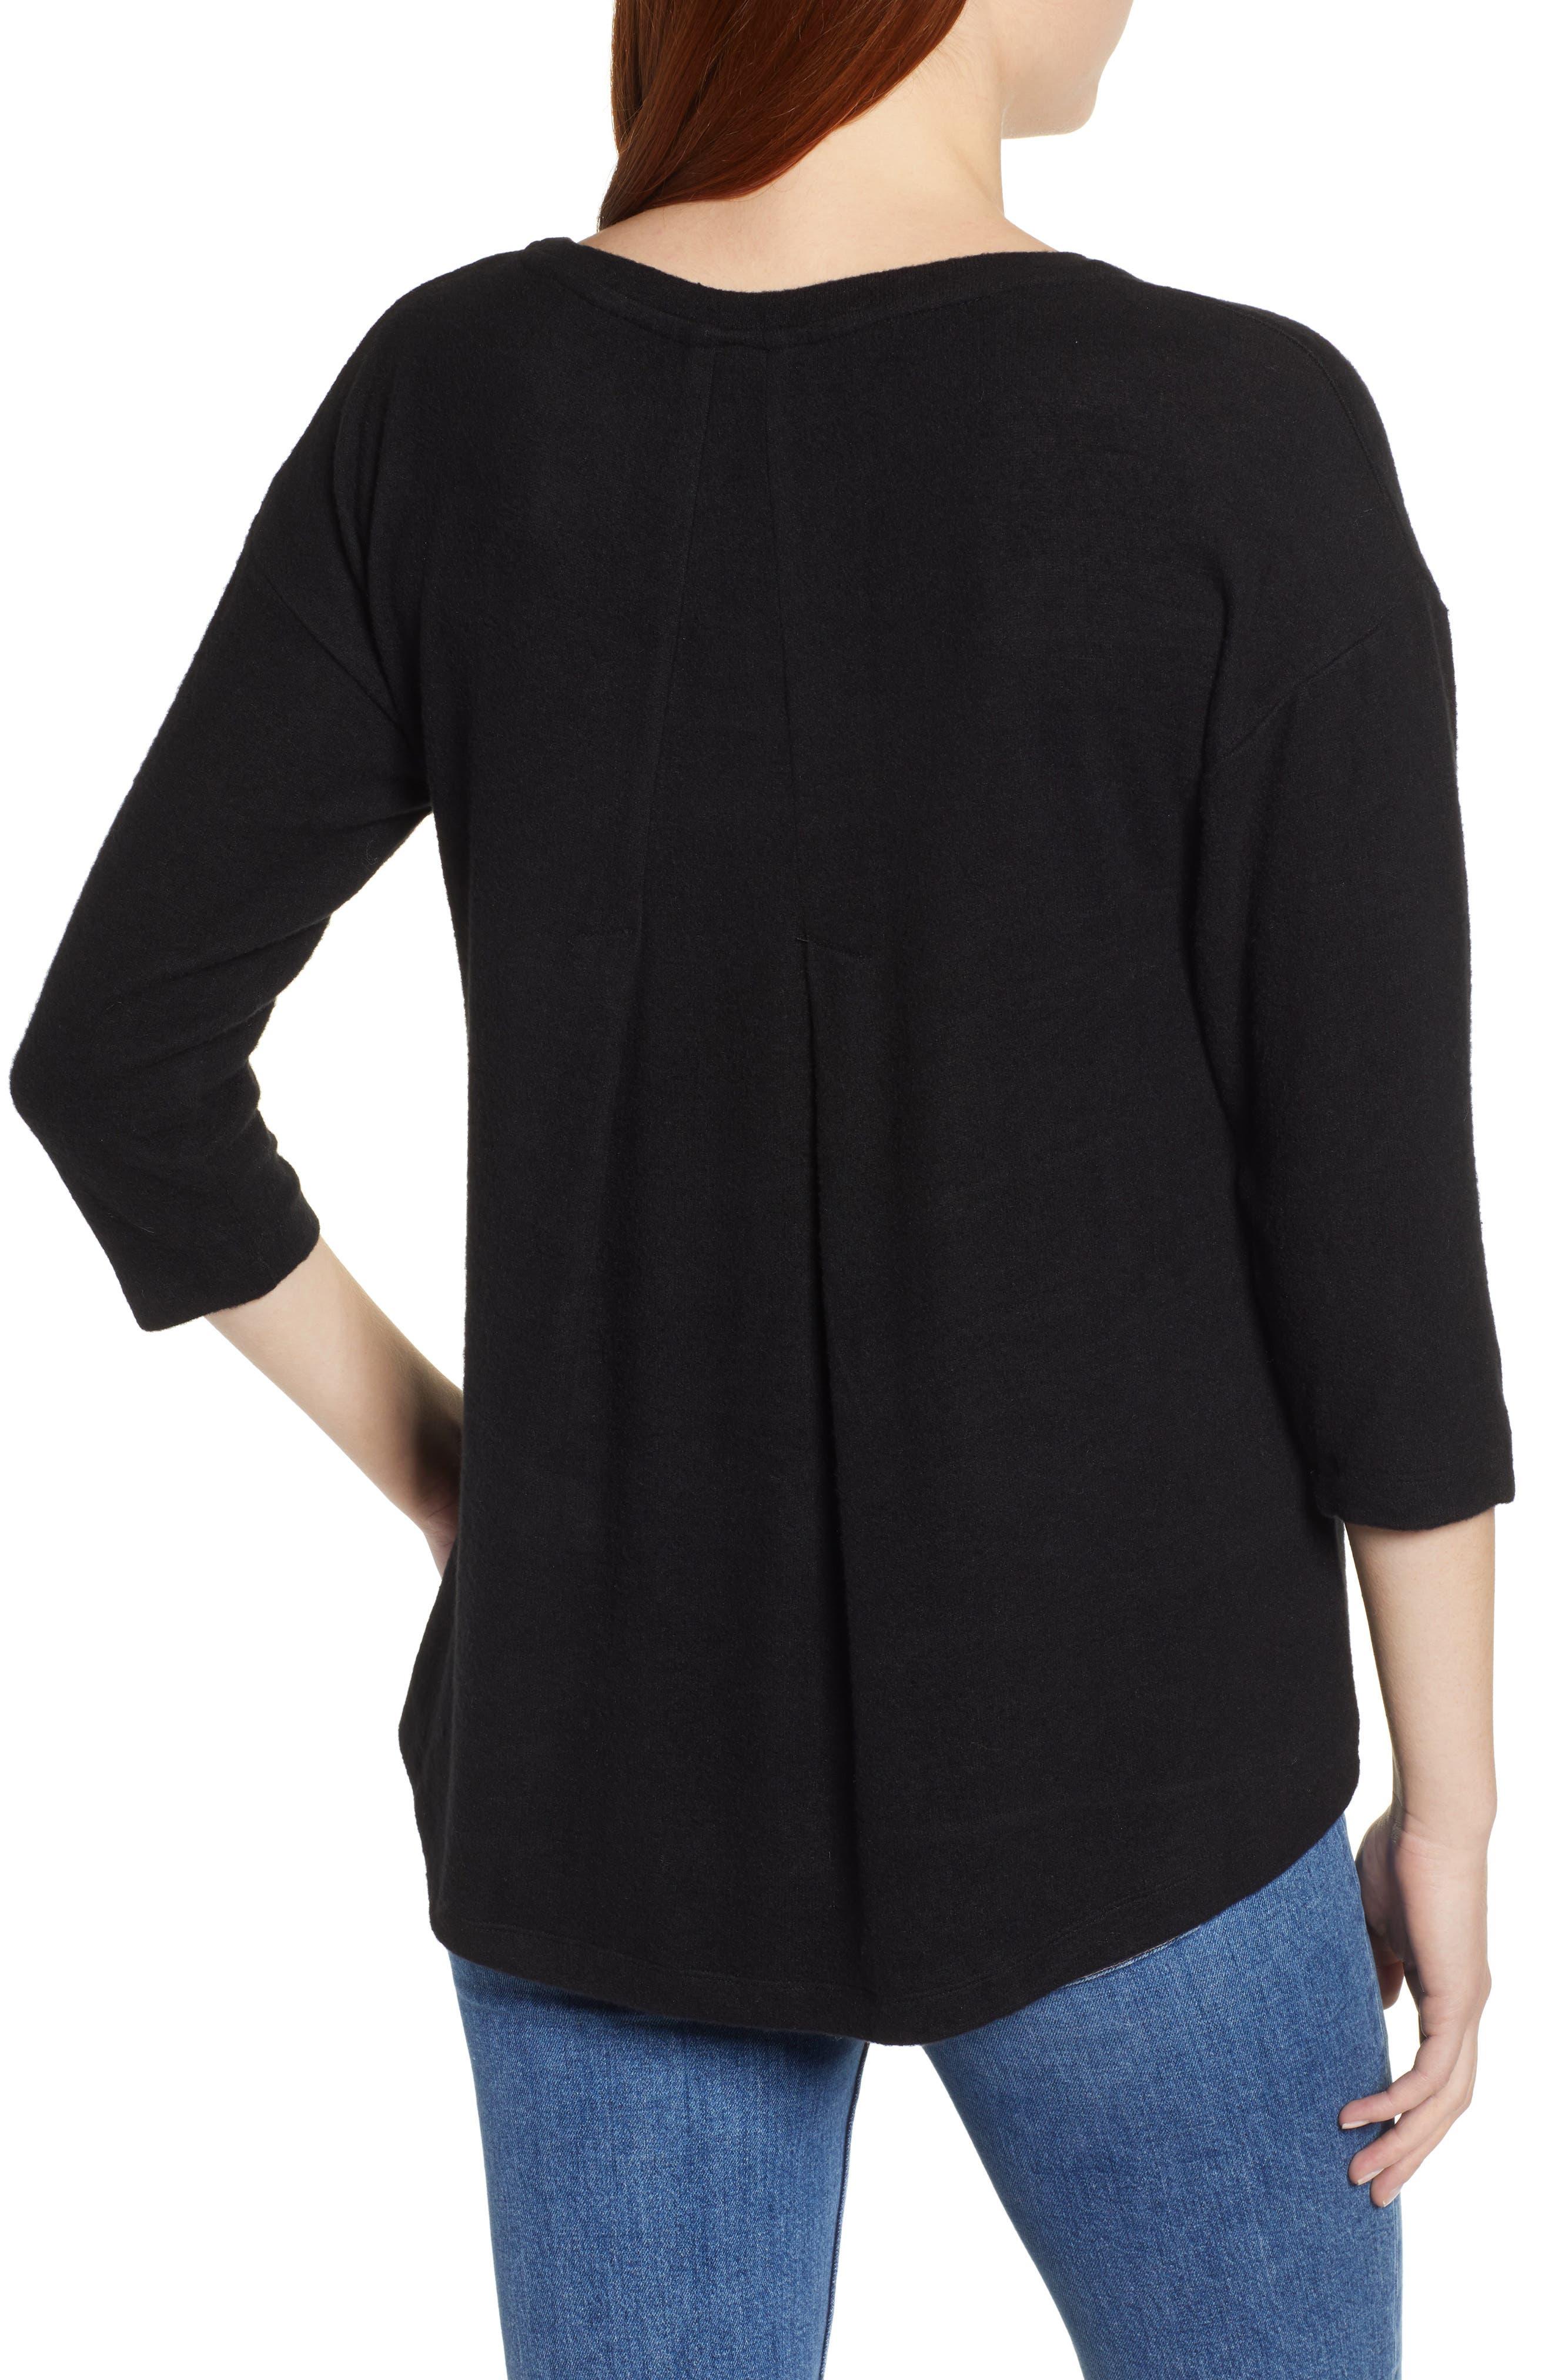 BOBEAU,                             Pleat Back Pullover,                             Alternate thumbnail 2, color,                             001